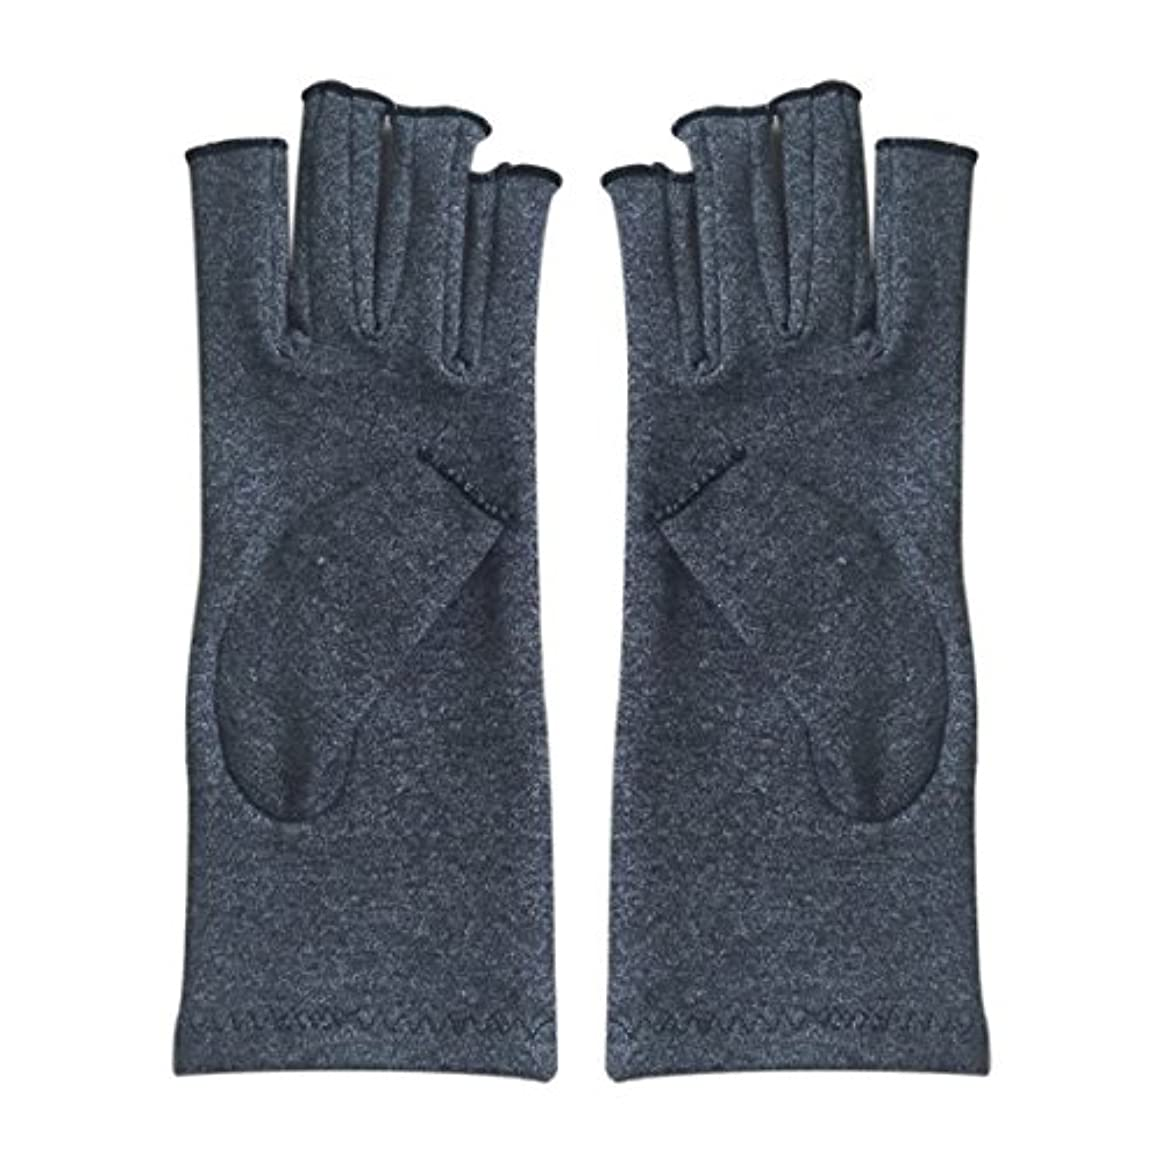 SODIAL 1ペア成人男性女性用弾性コットンコンプレッション手袋手関節炎関節痛鎮痛軽減S -灰色、S